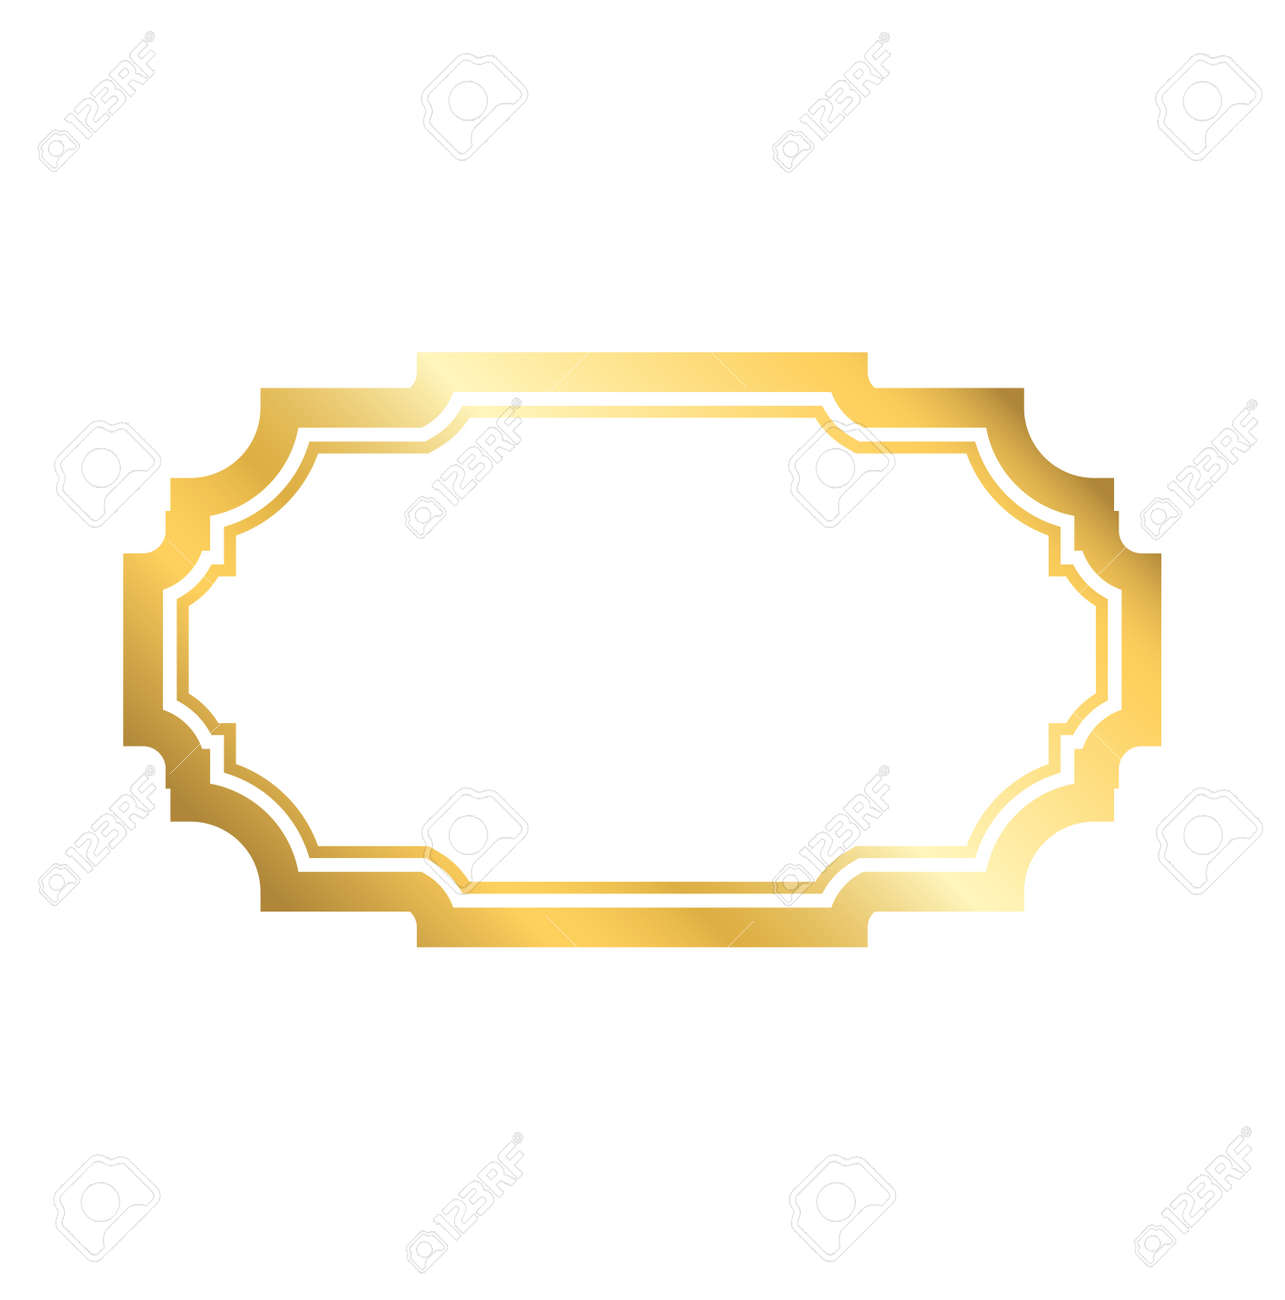 e7ad4348e27e Gold frame. Beautiful simple golden design. Vintage style decorative  border